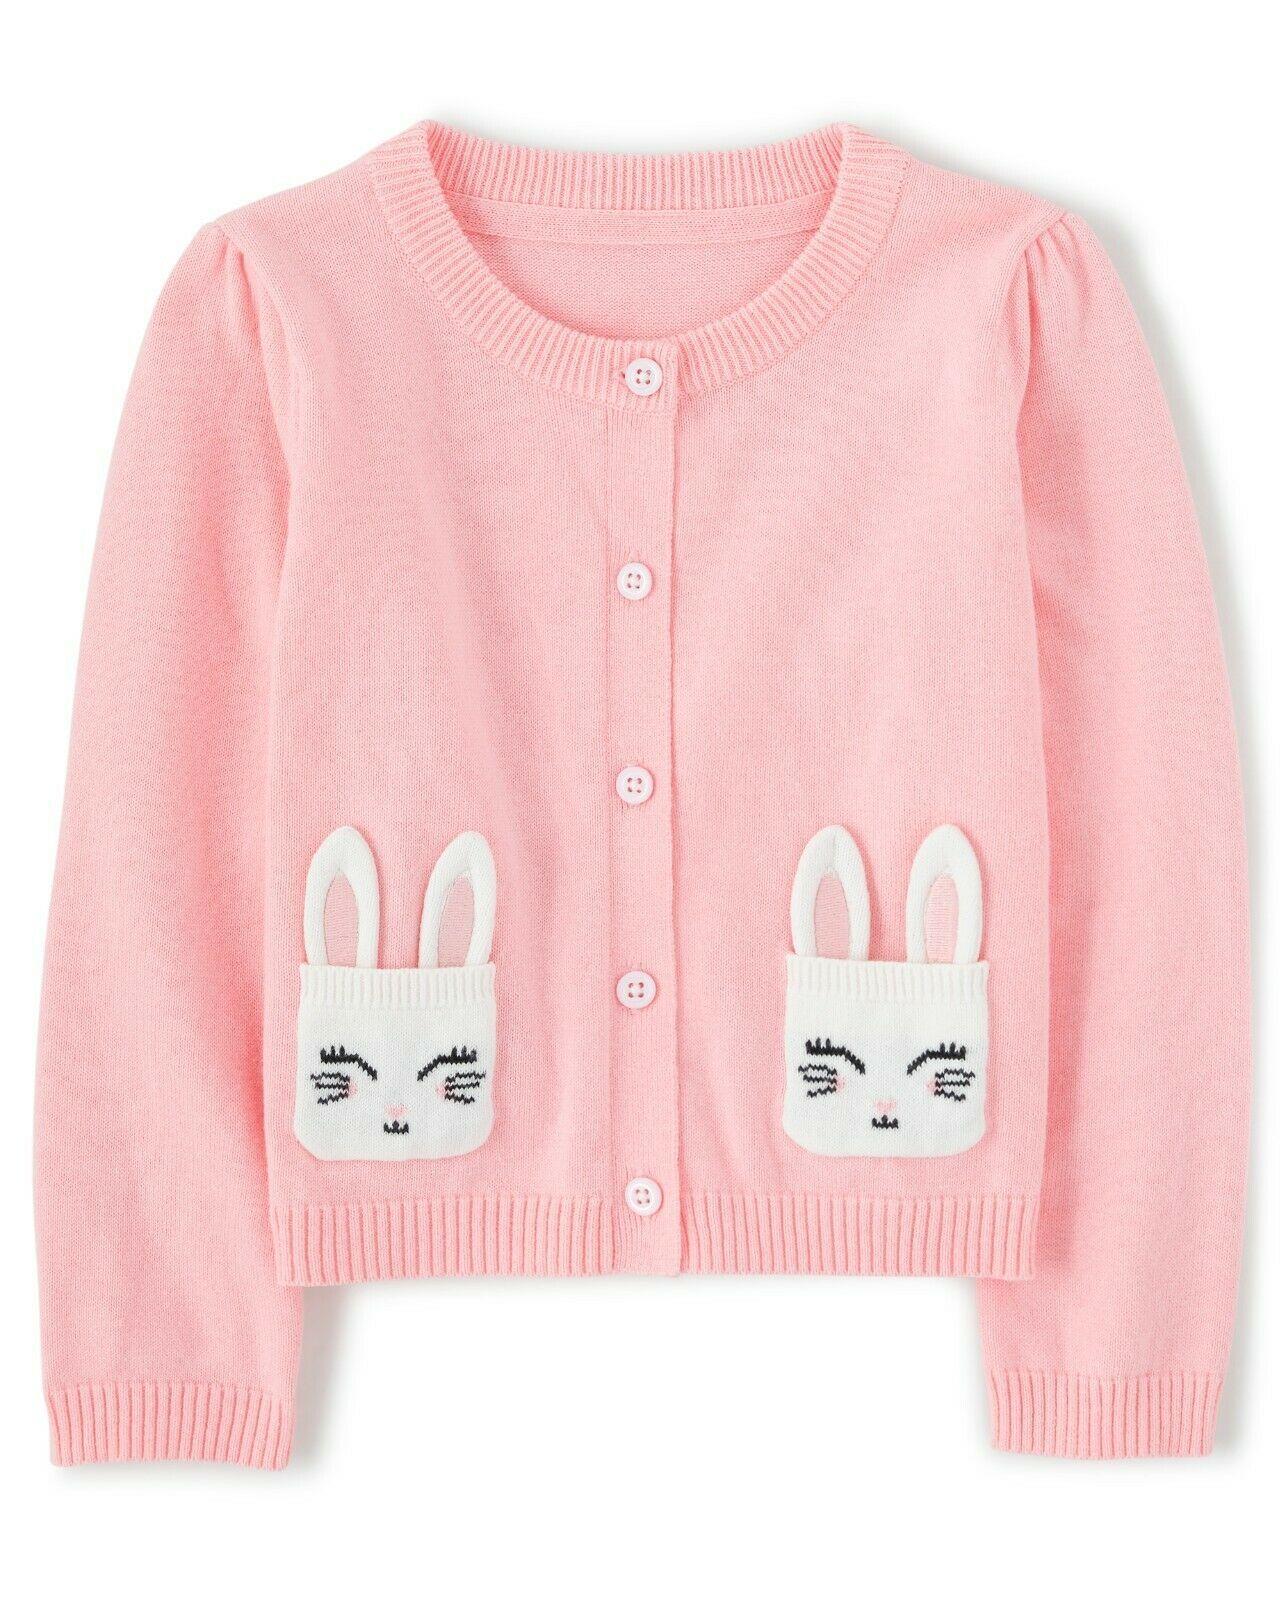 Gymboree Toddler Girls Bunny Rabbit Sweater Cardigan 18-24 Months NWT - $12.99